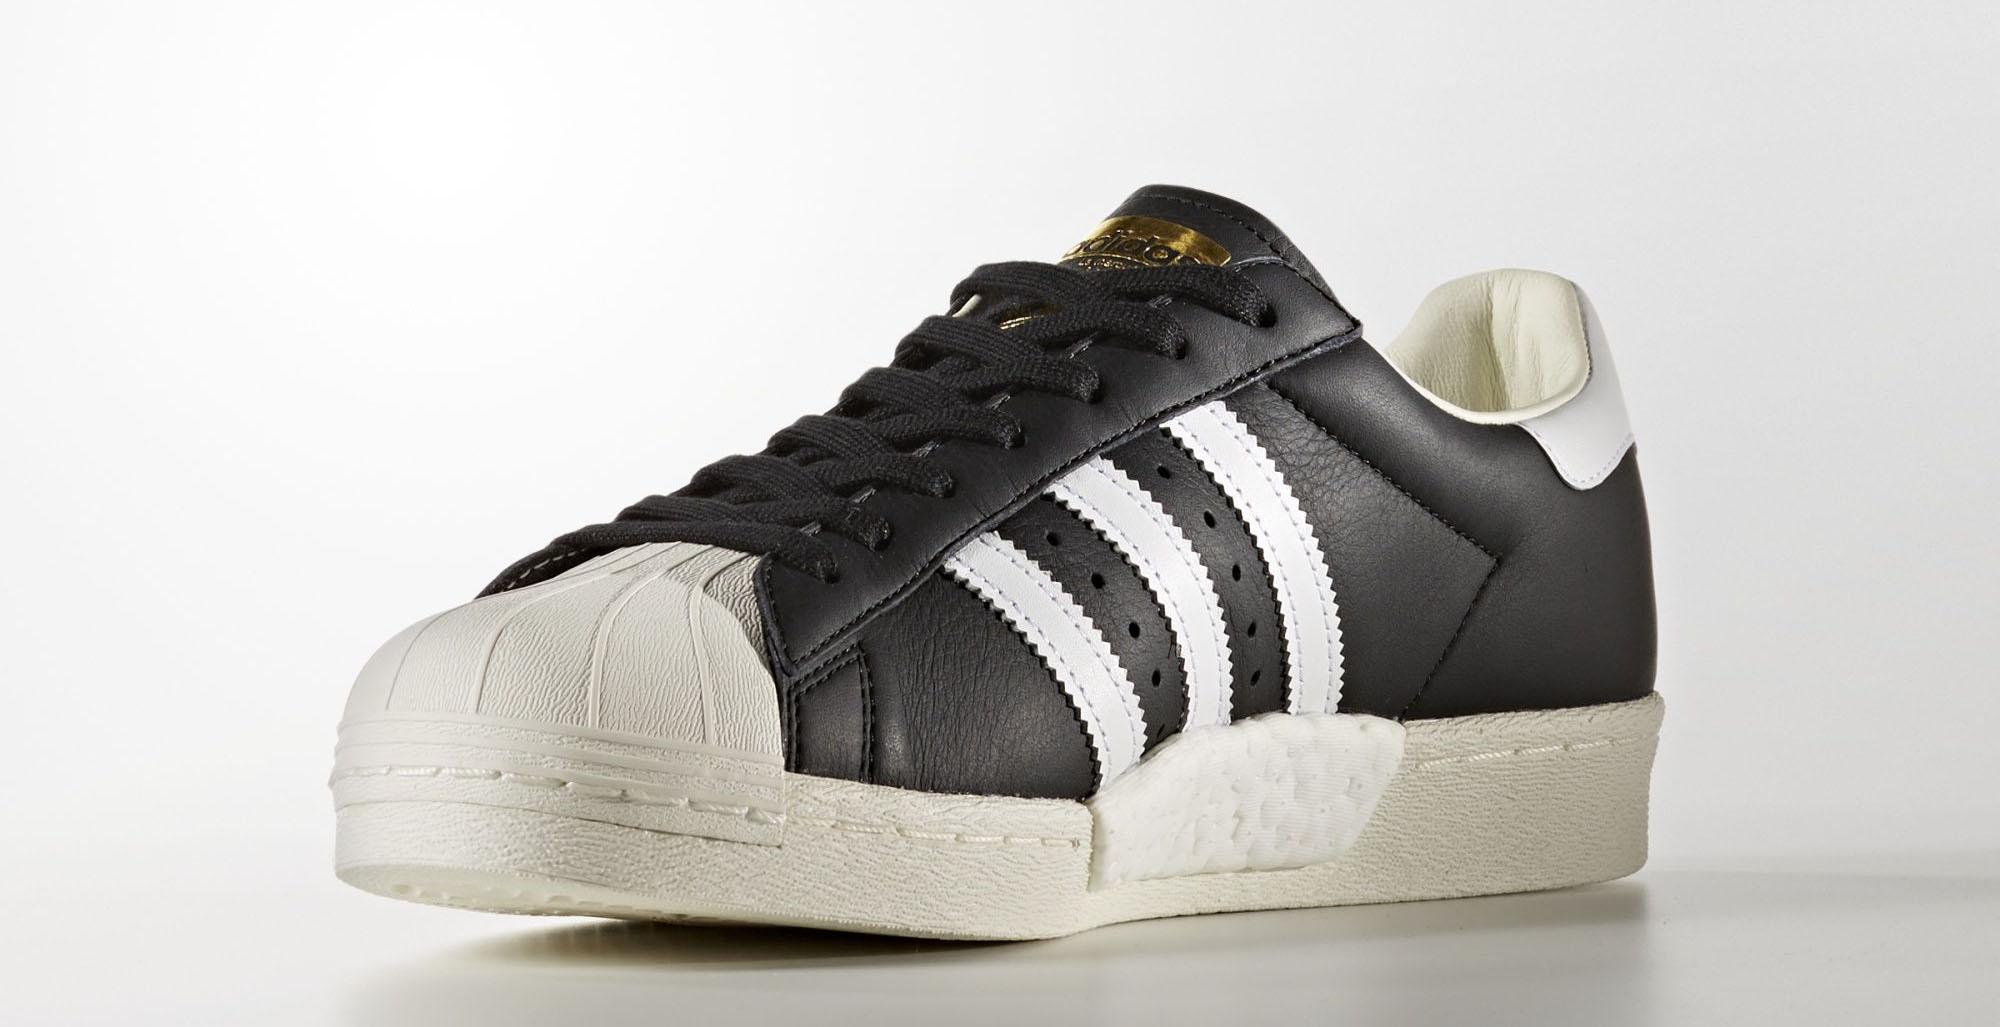 adidas Superstar core blackfootwear whitegold metallic